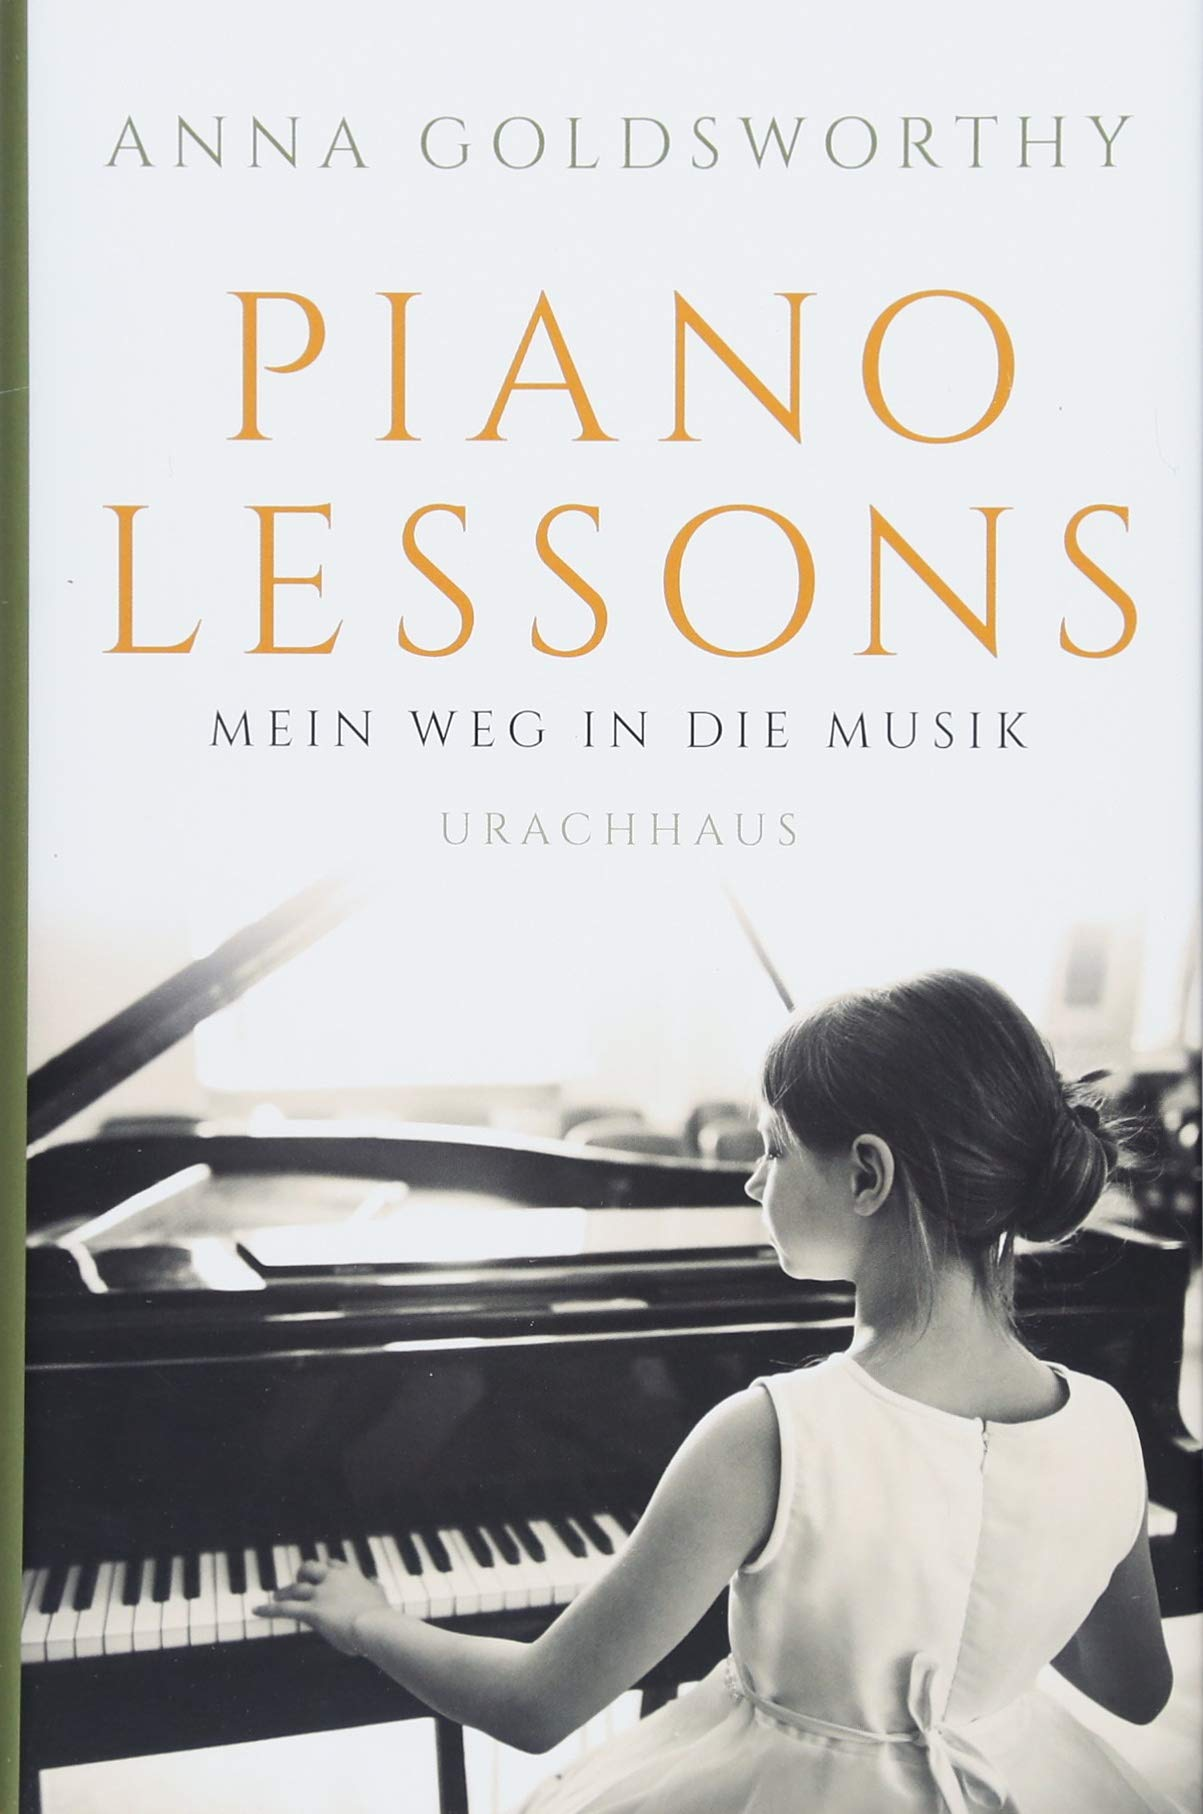 piano-lessons-mein-weg-in-die-musik